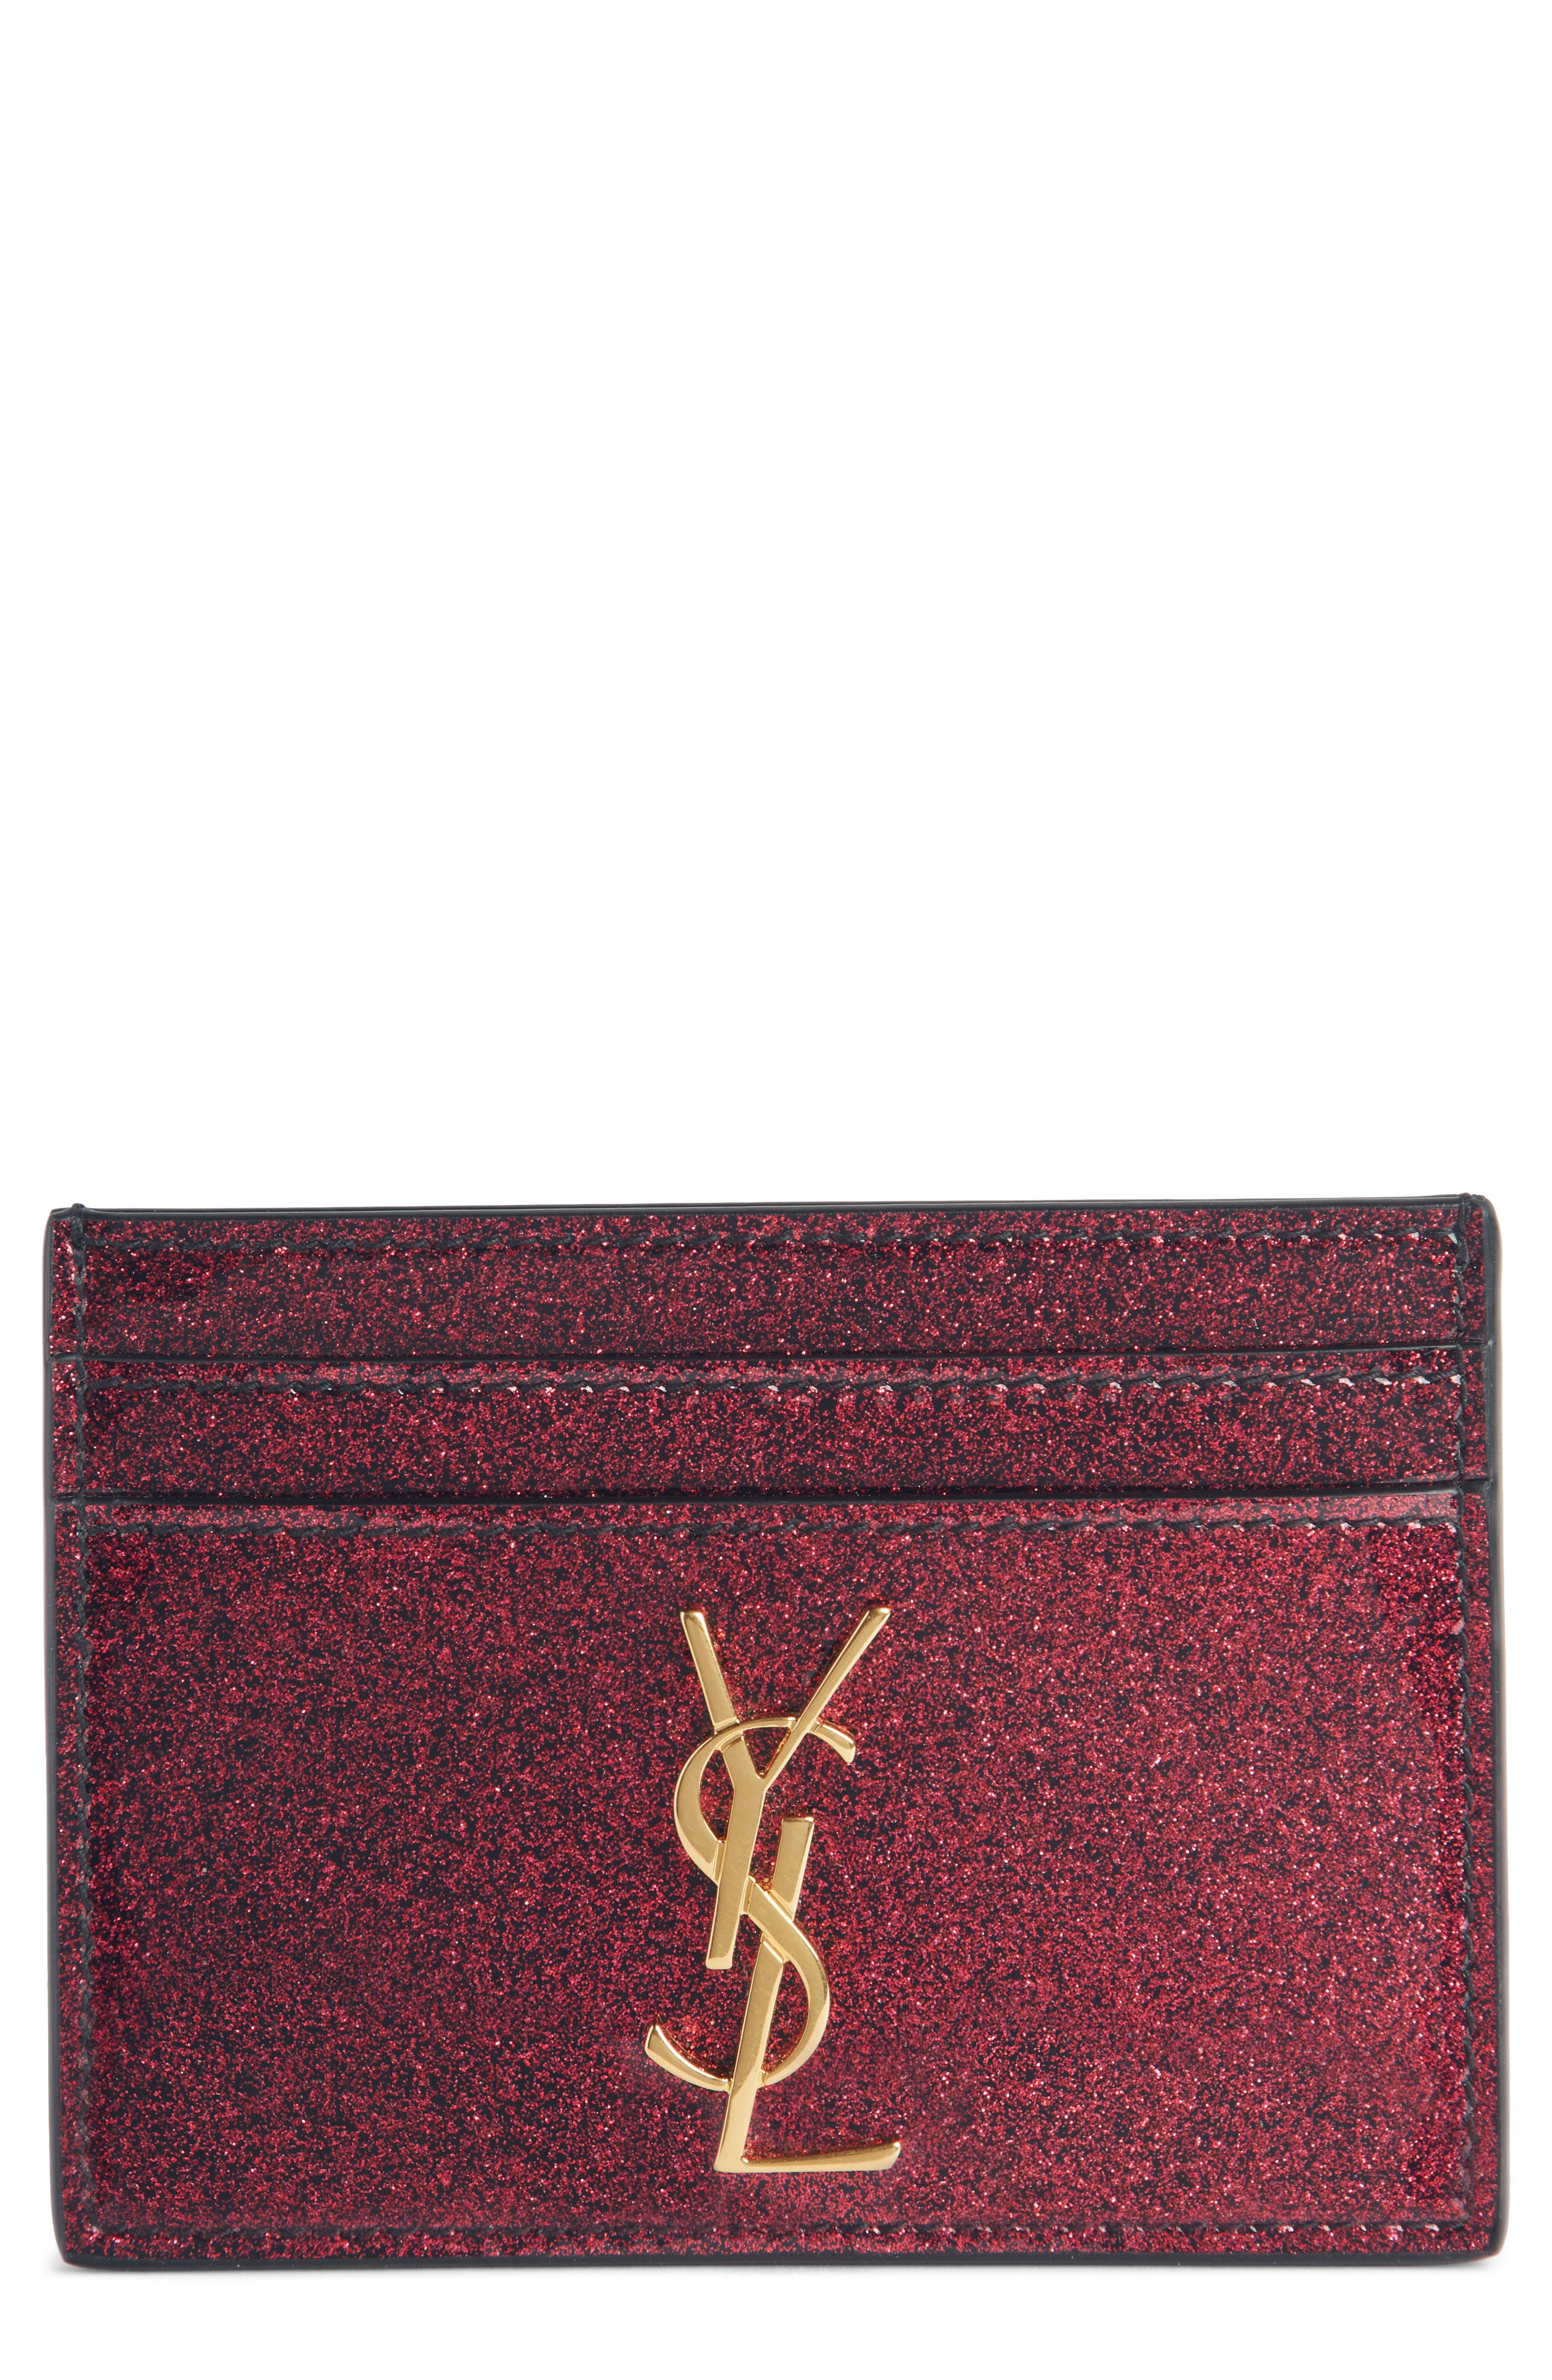 Monogram Vernis Glitter Calfskin Leather Card Case,                             Main thumbnail 1, color,                             SHOCKING PINK/ NOIR